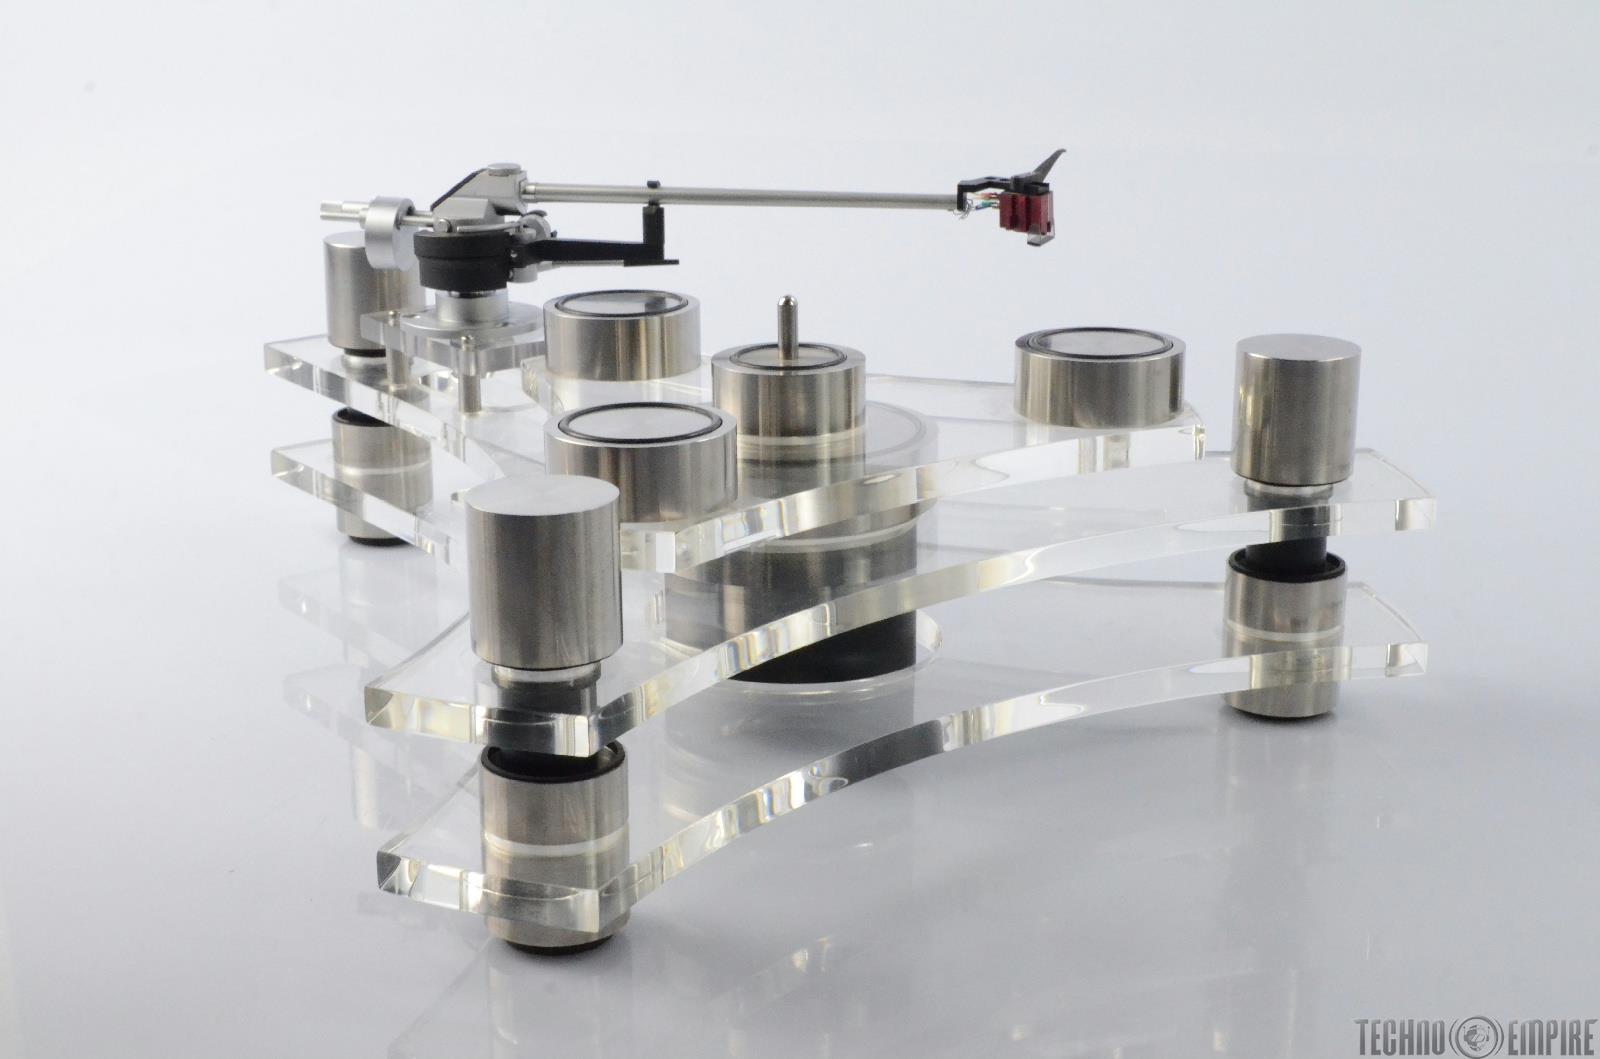 GALE GT2101 HiFi Acrylic Optical Servo Turntable w/ Signet XK50 Tone Arm #26548